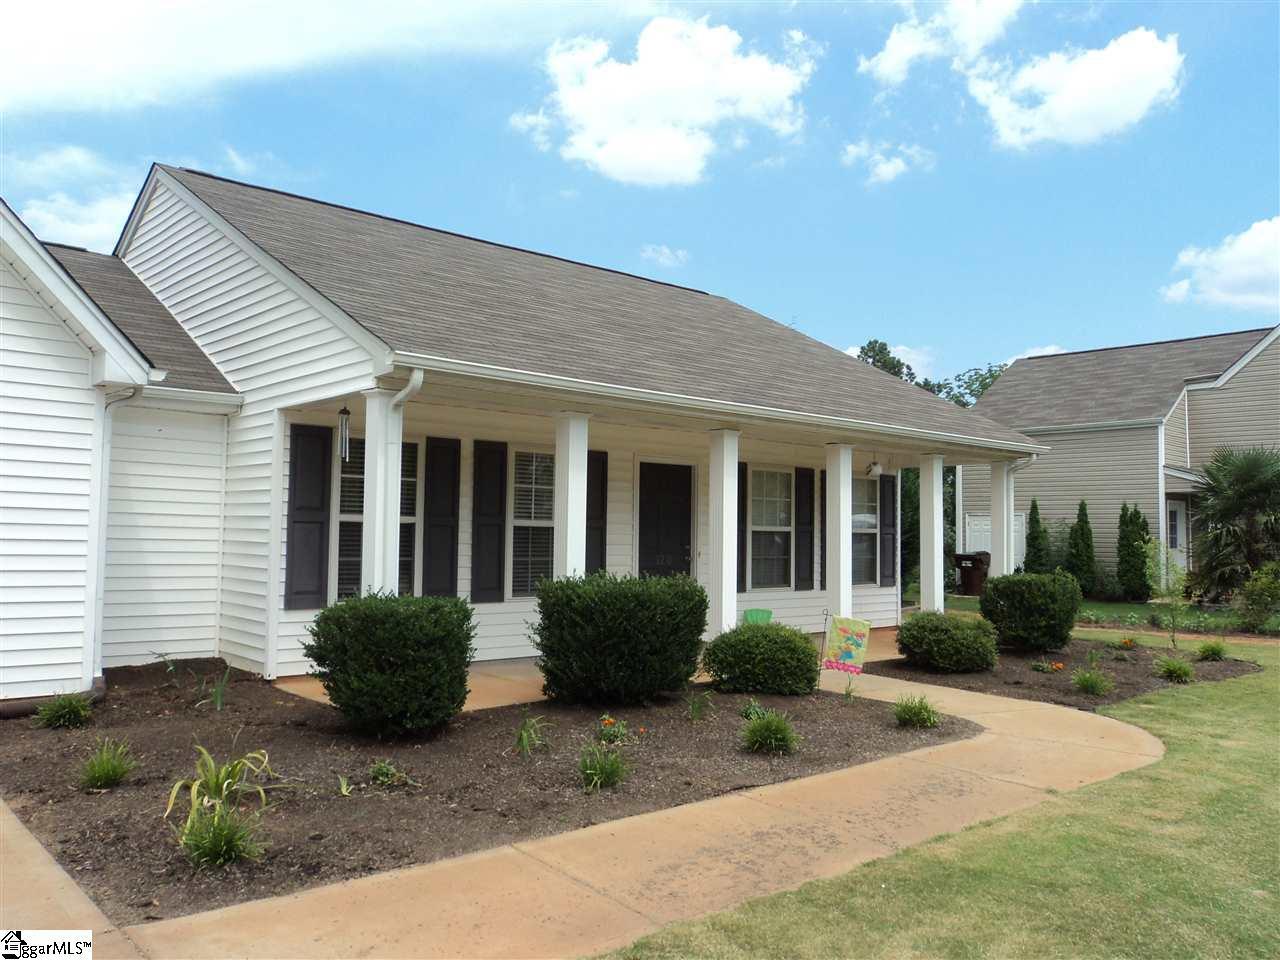 120 Largess Lane, Piedmont, SC 29673 (#1336280) :: Hamilton & Co. of Keller Williams Greenville Upstate